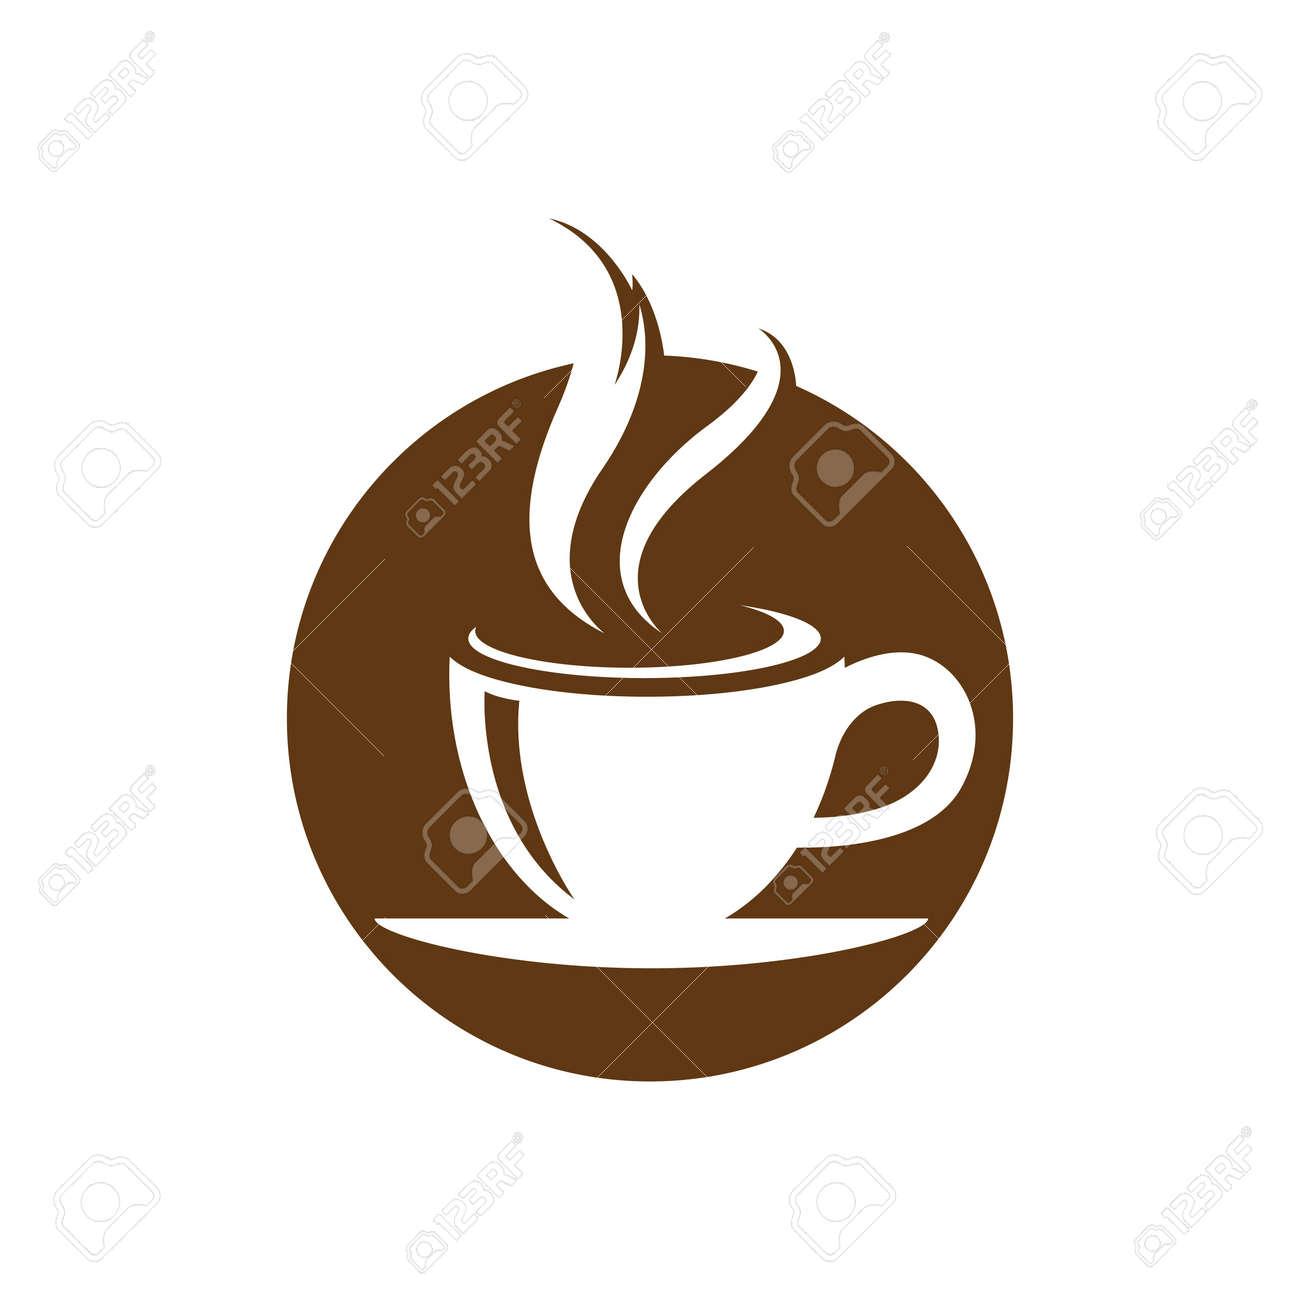 Coffee cup logo images illustration design - 172261487